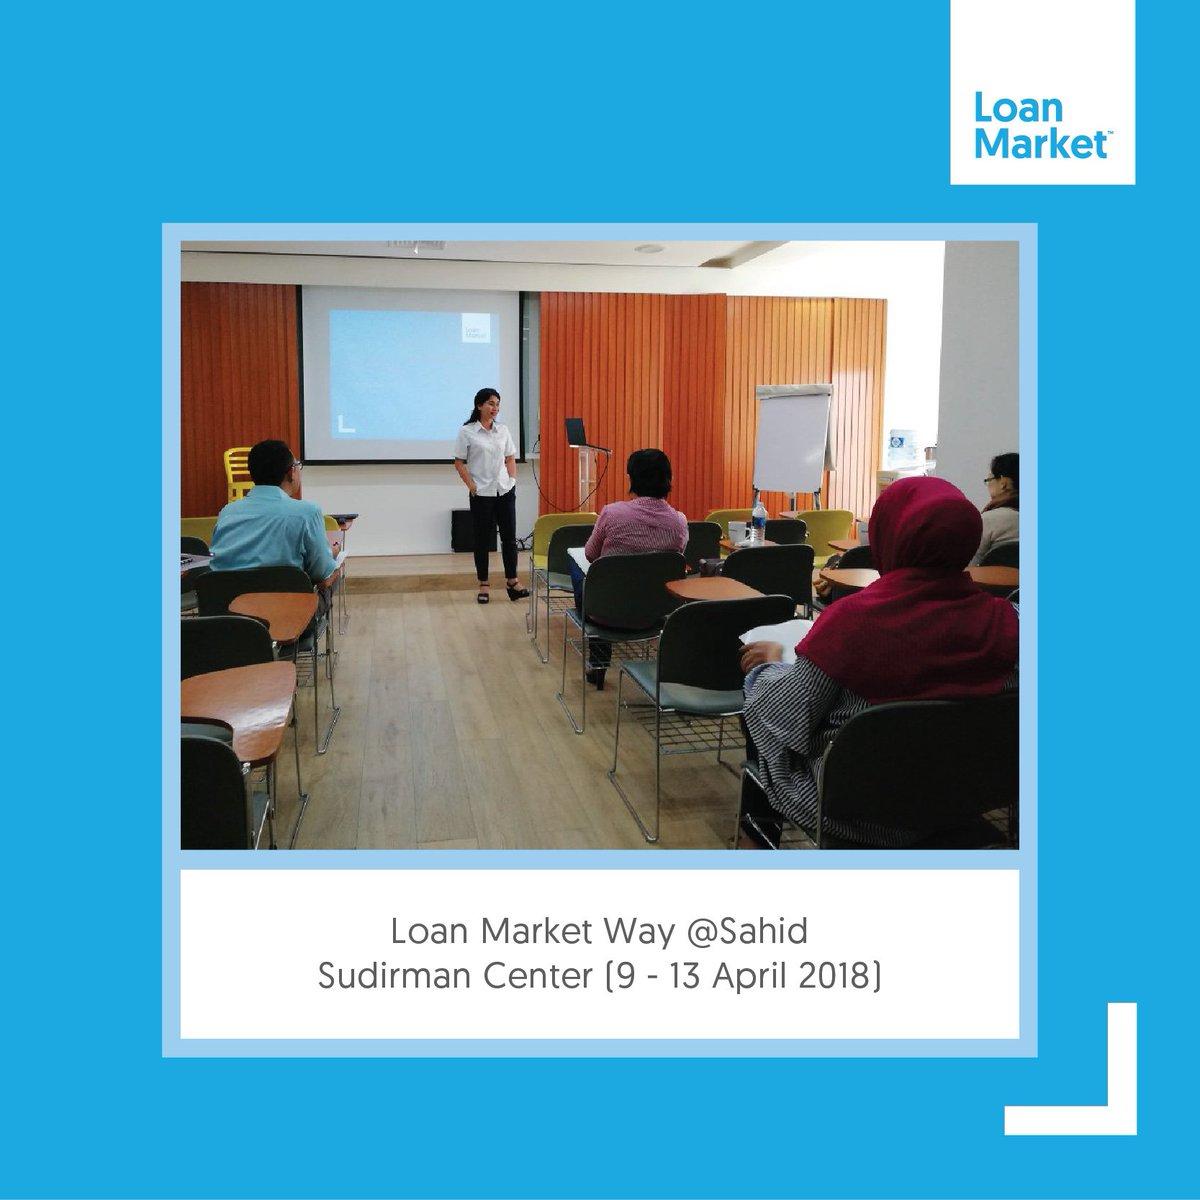 Loan Market Way @Sahid Sudirman Center (9-13 April 2018) . . . #loanmarket #loanadviser #loanmarketway #event #training #2018 #finance #business #professional #new #april #loanmarketindonesia #loans #marketpic.twitter.com/lc5VIh4svP